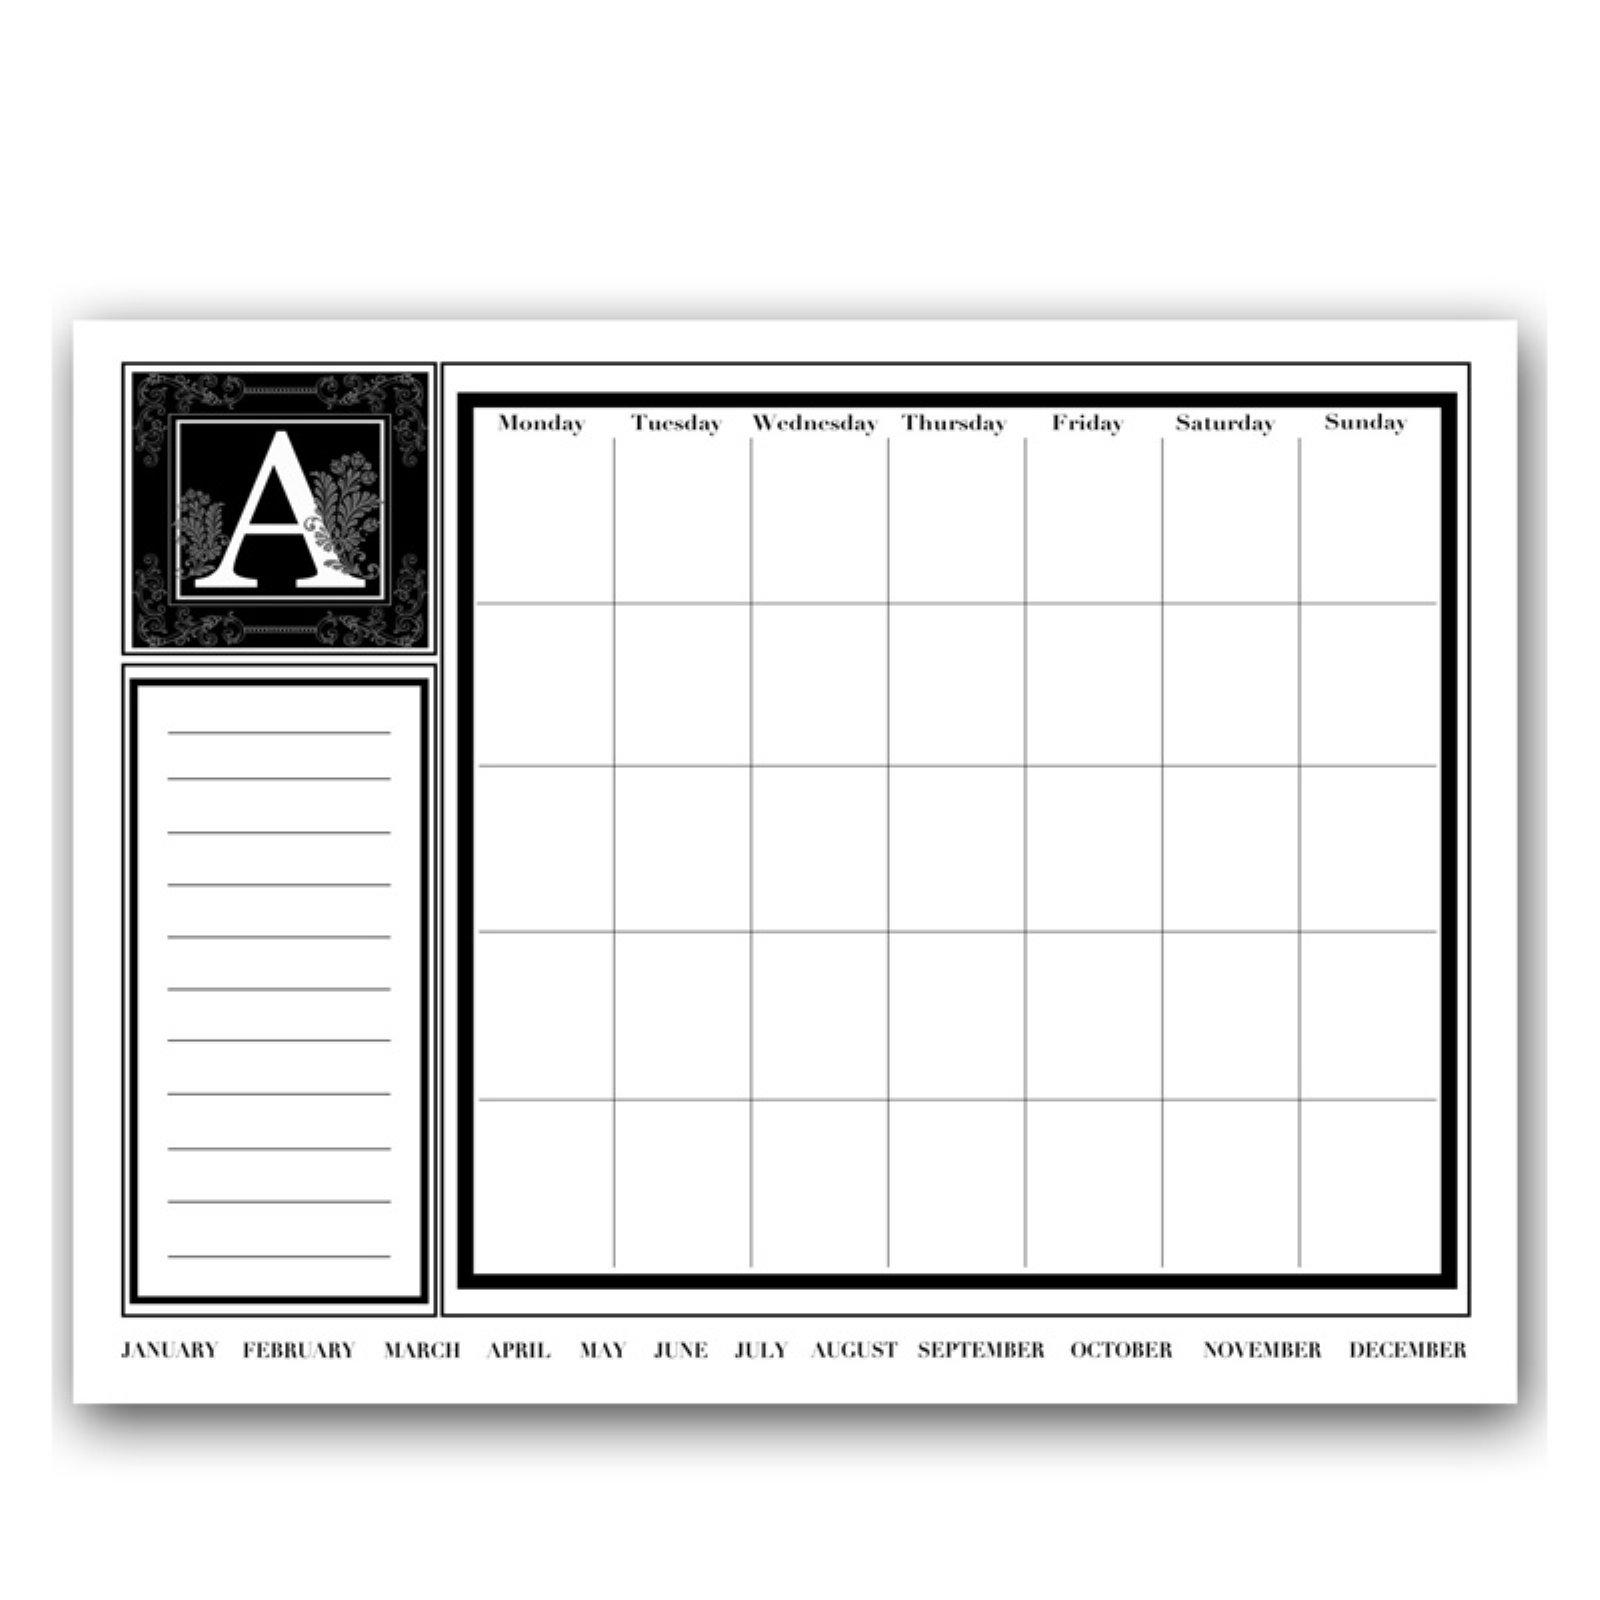 Ready2HangArt Monogram Monthly Dry Erase Calendar